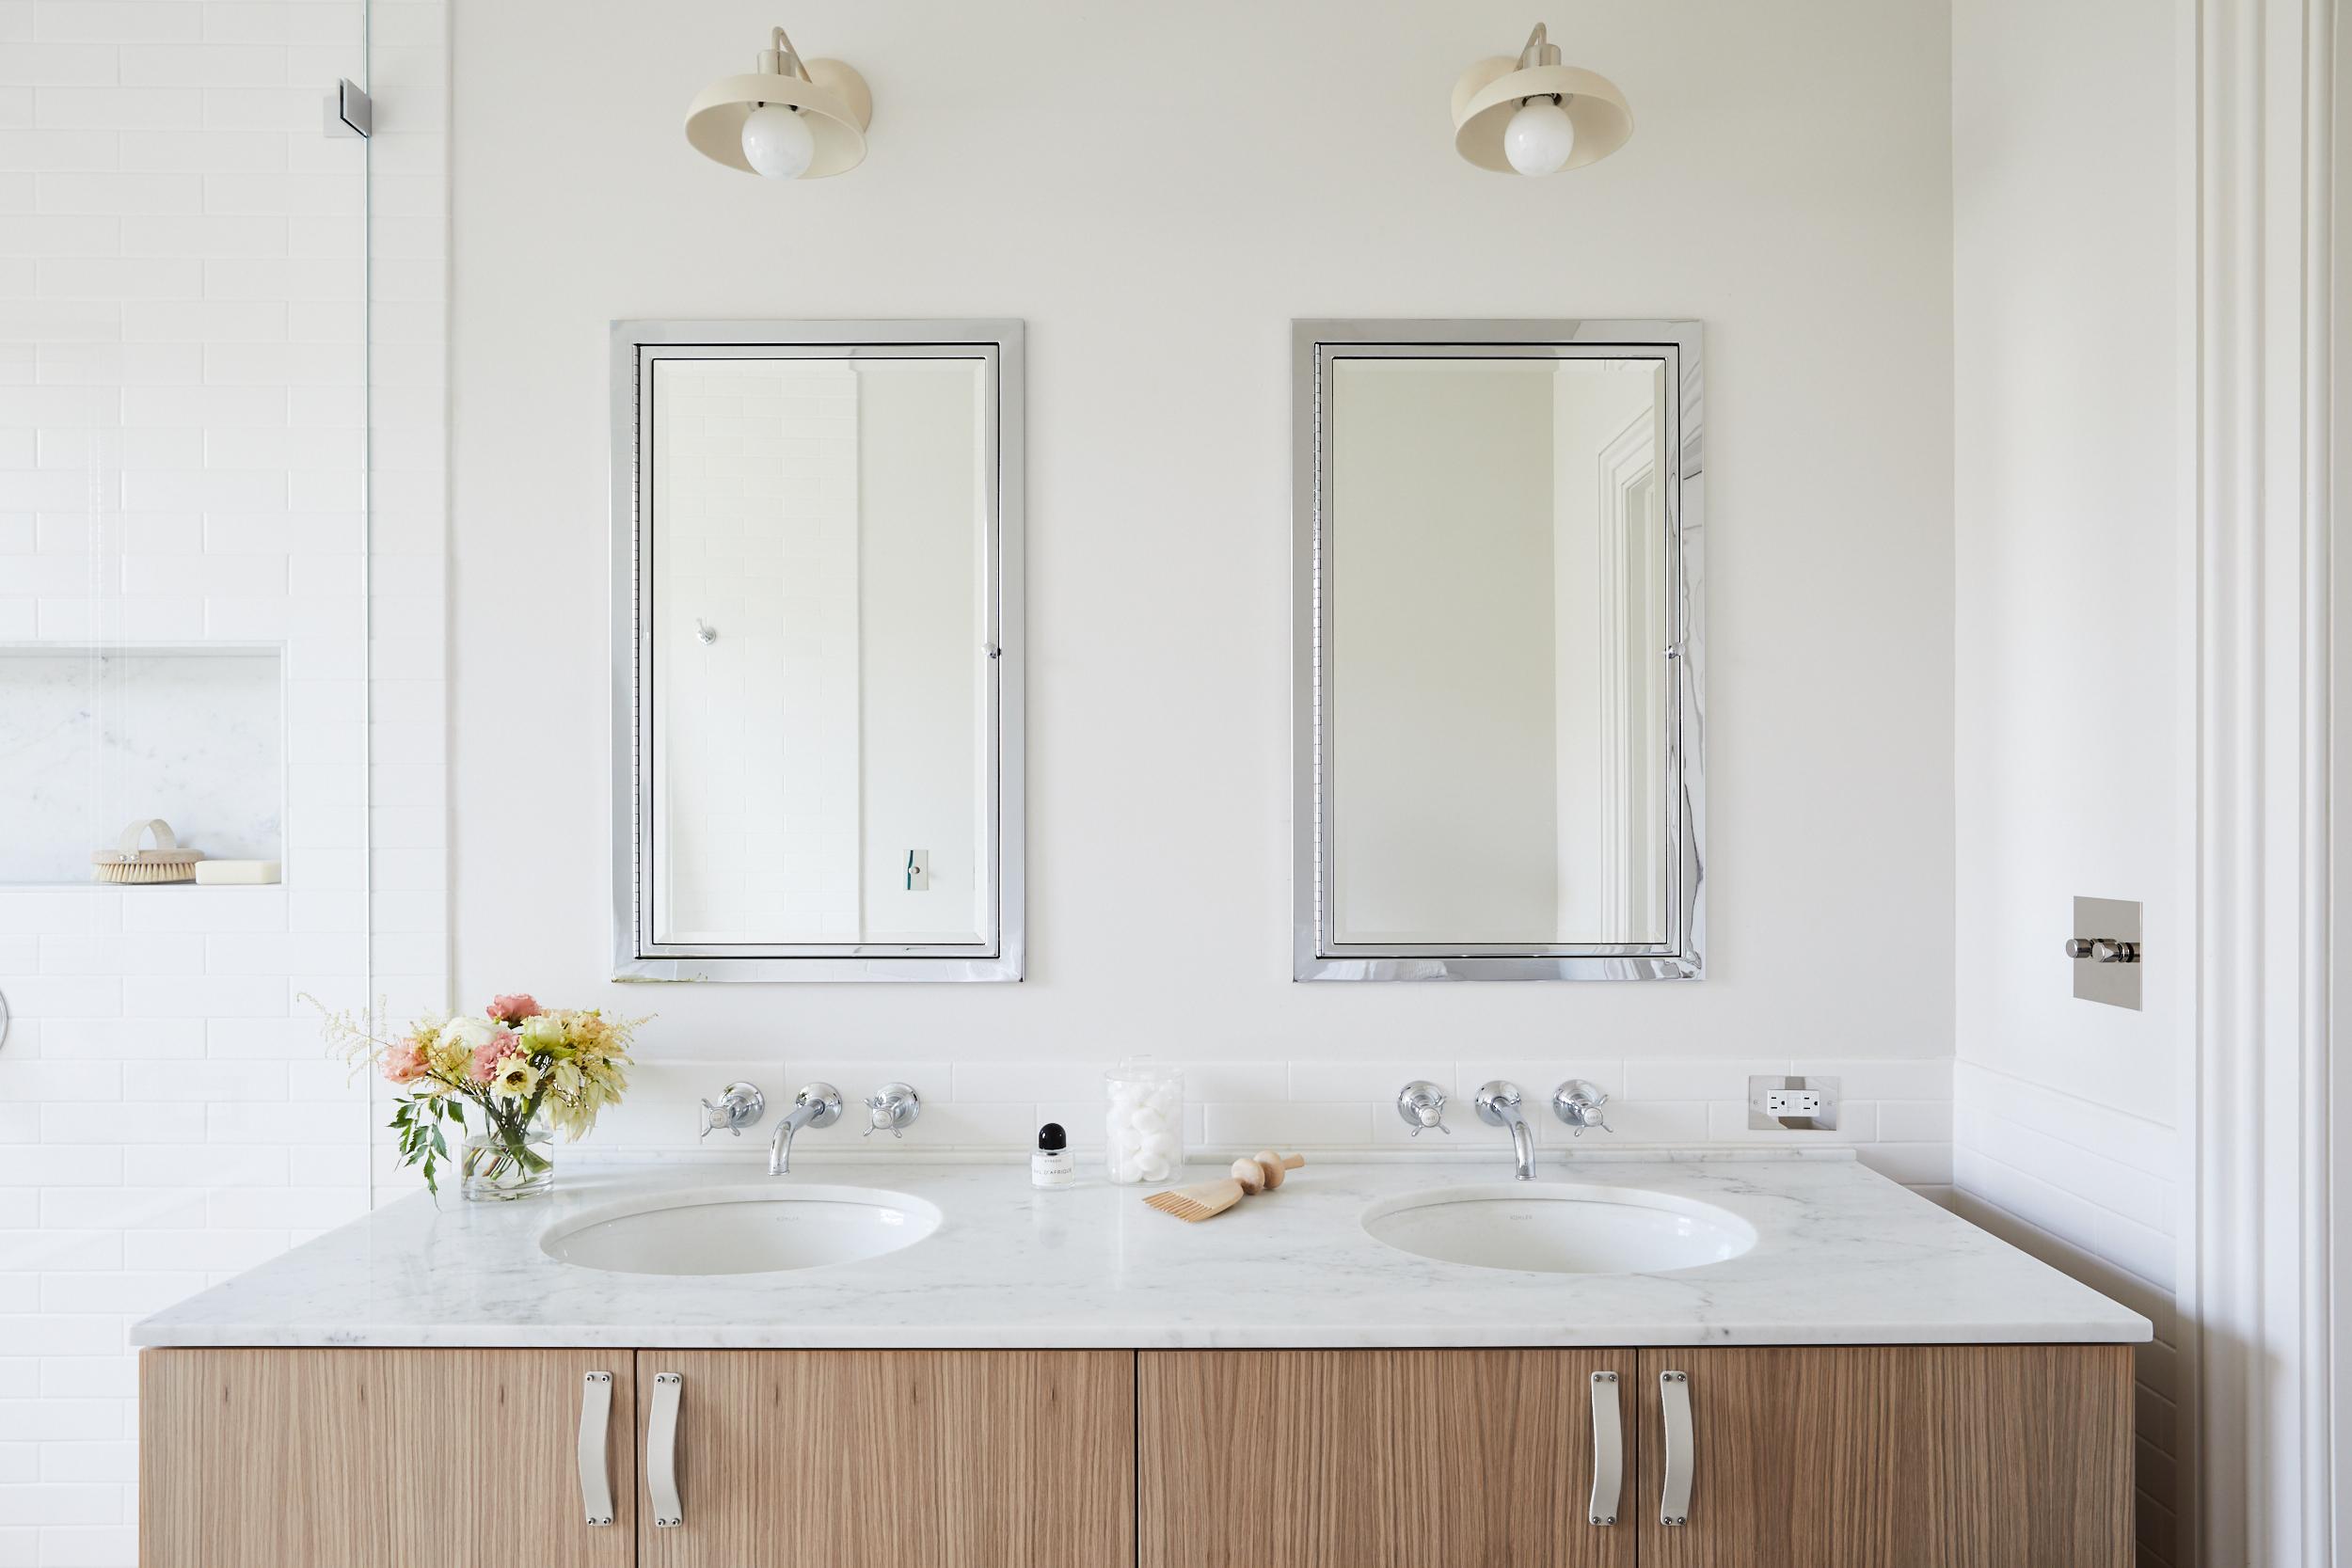 Slope_Townhouse_Bathroom_Master_008.jpg